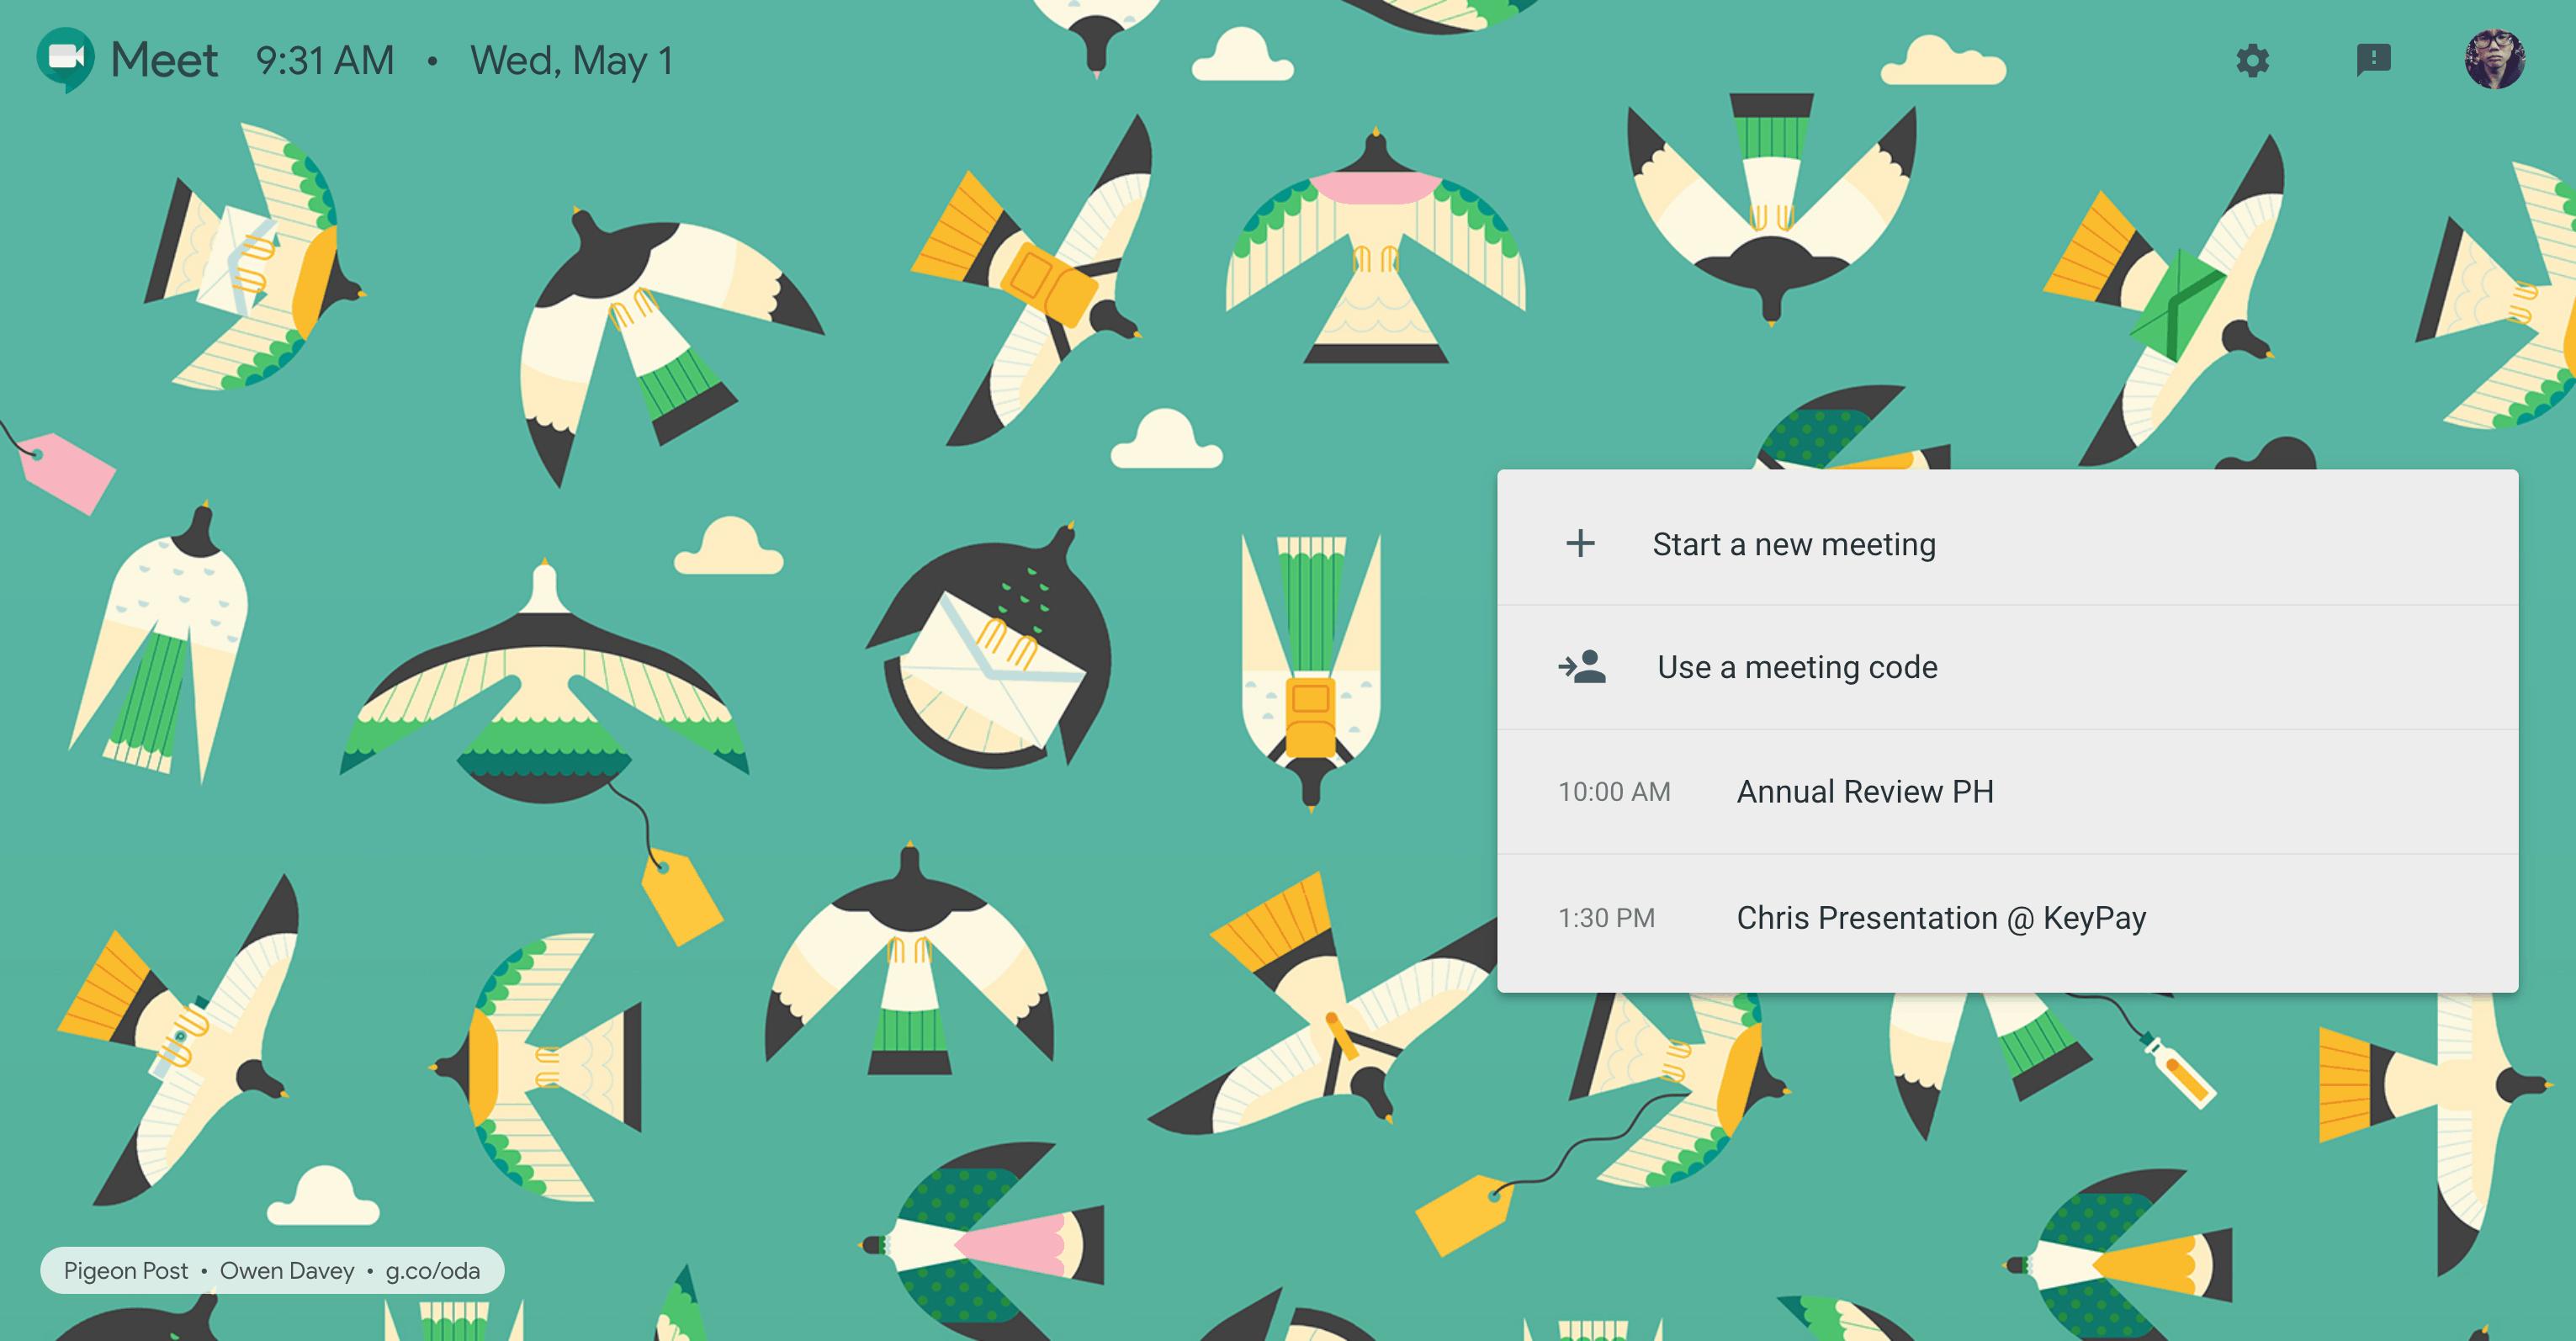 Join meeting screen by Google Meet